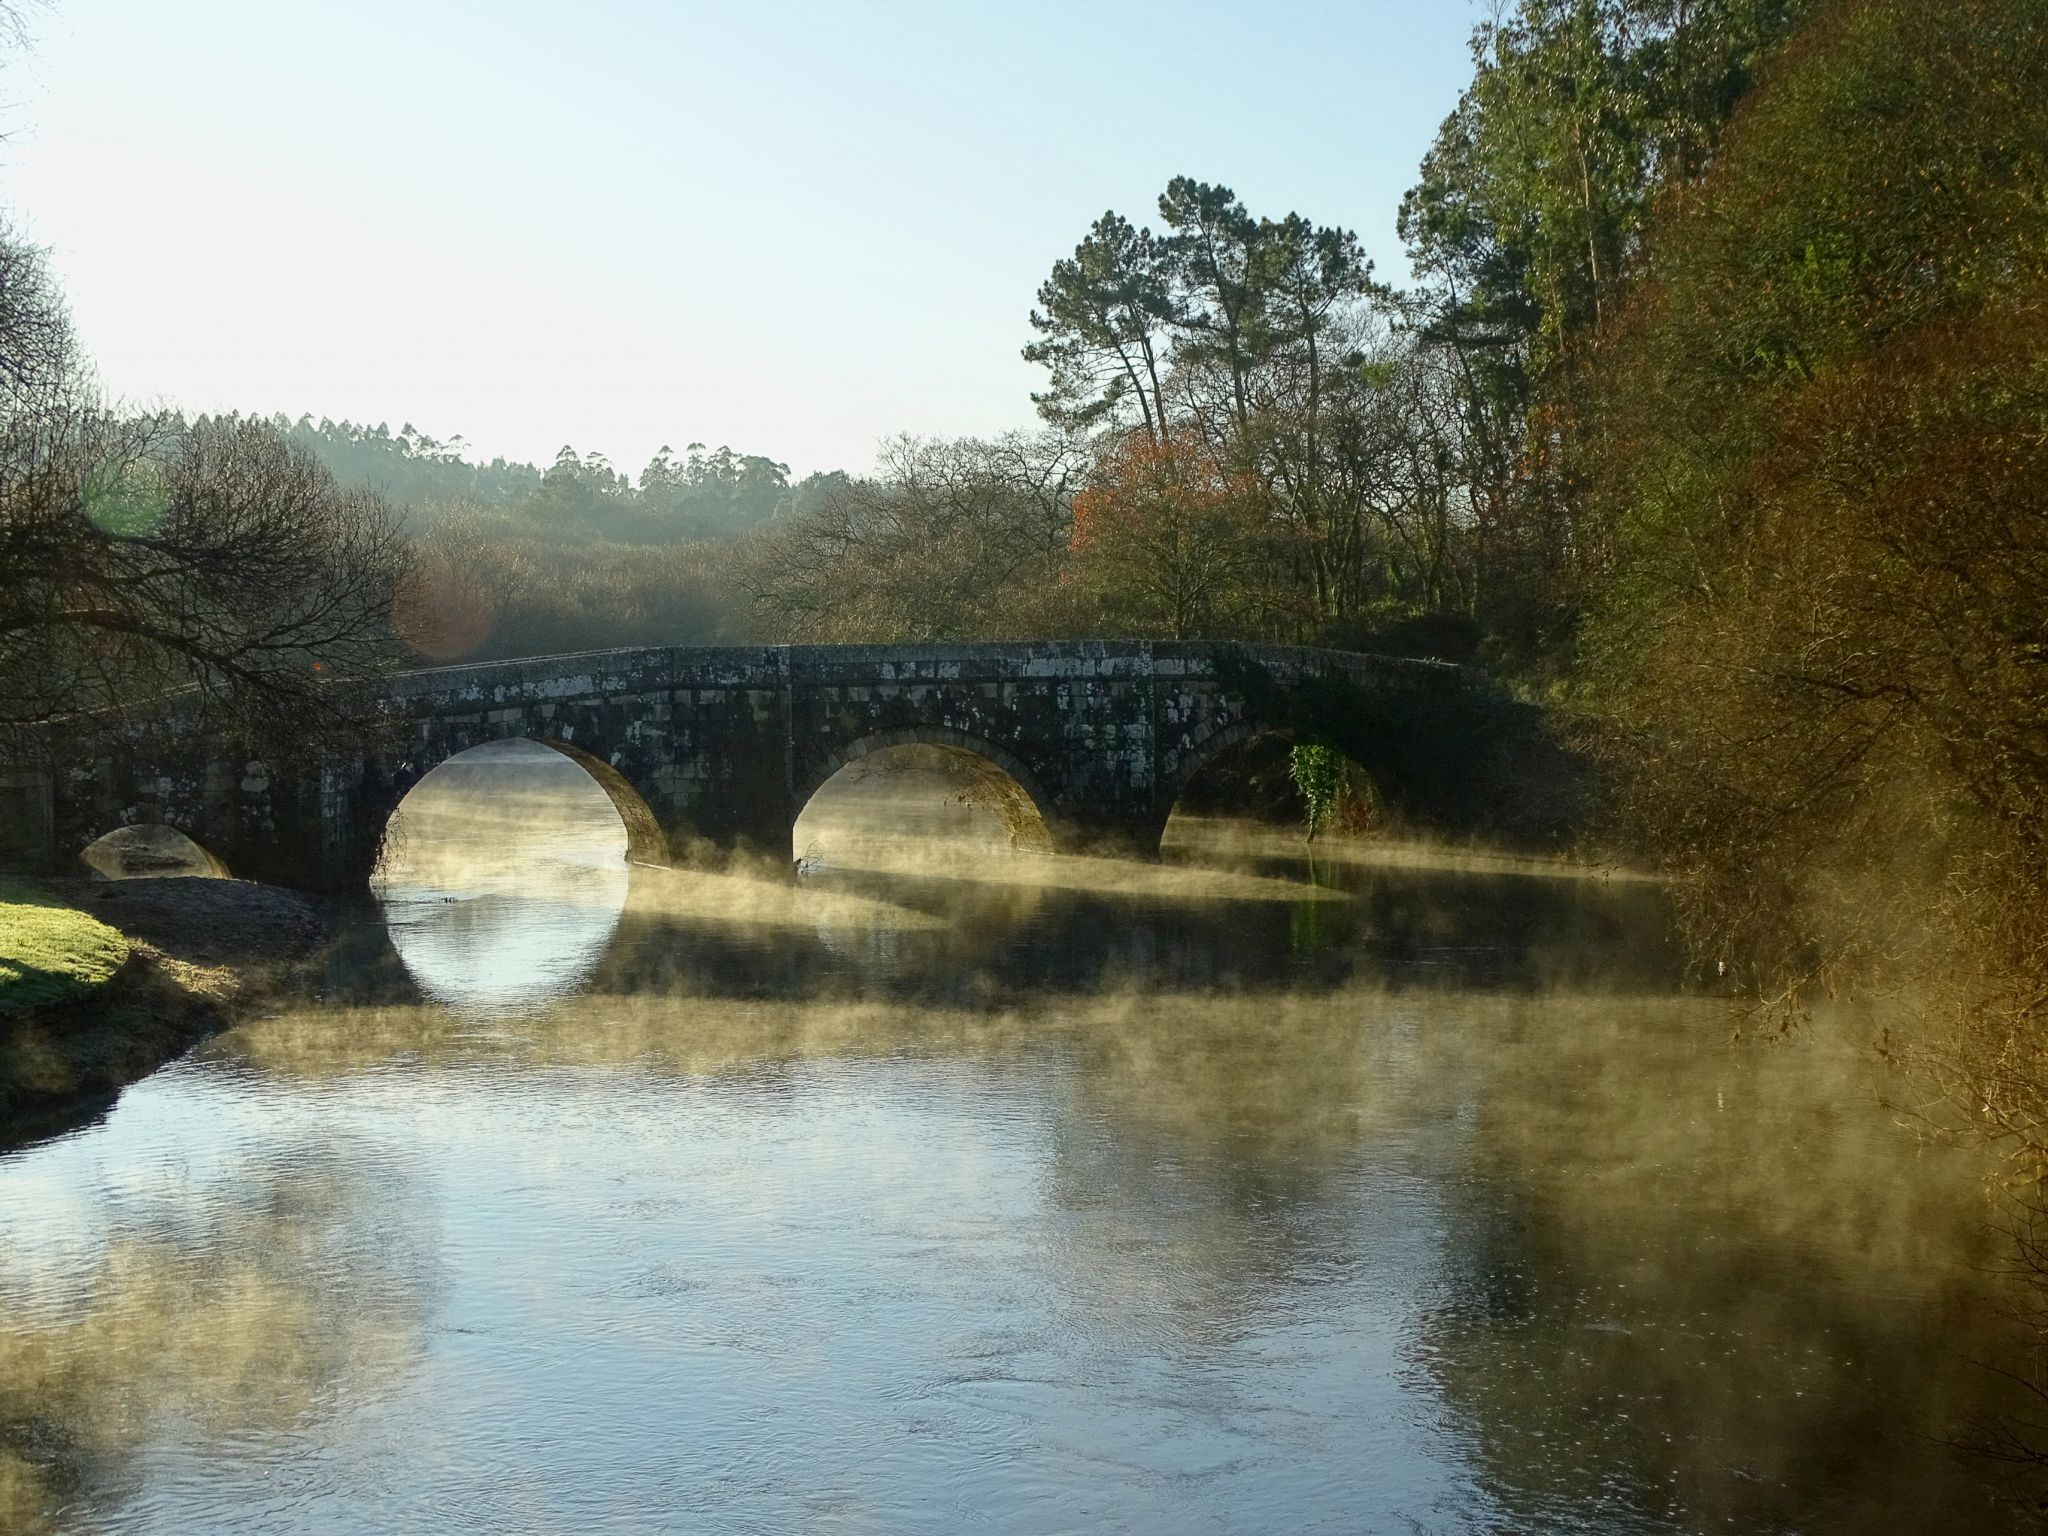 Puente romano de Brandomil, Spain